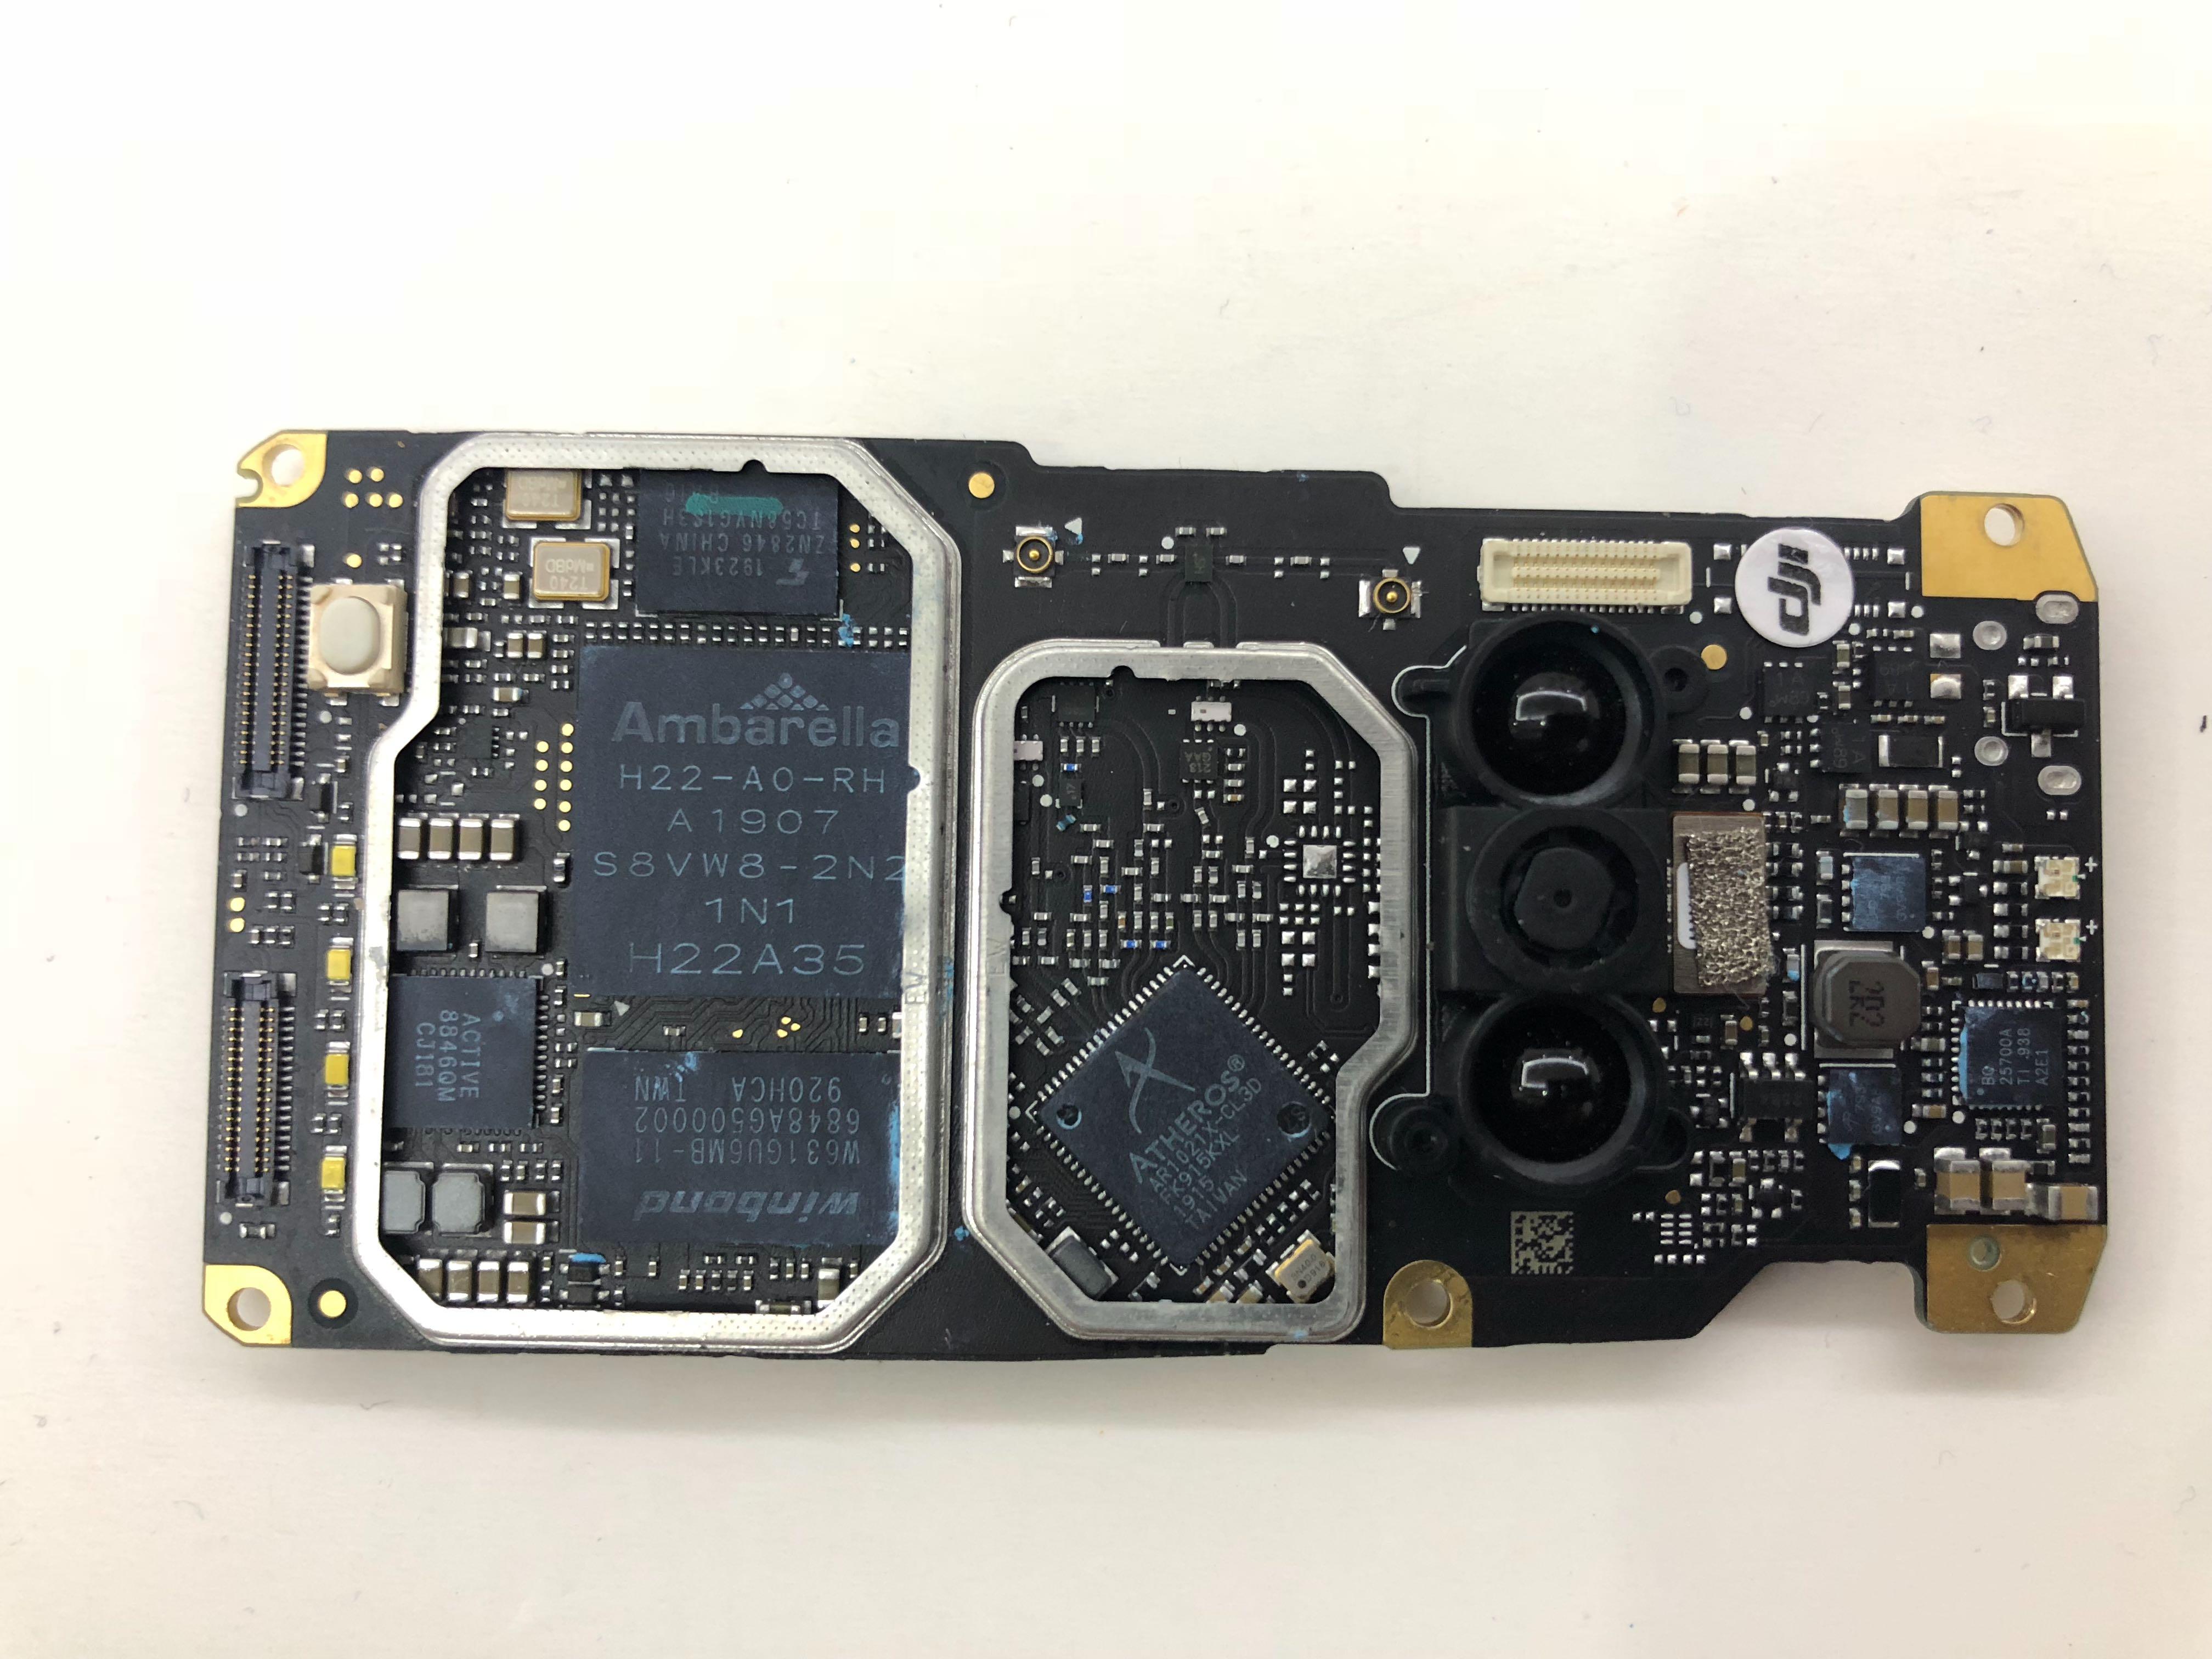 2 Versions Mavic Mini Hardware Dji Forum